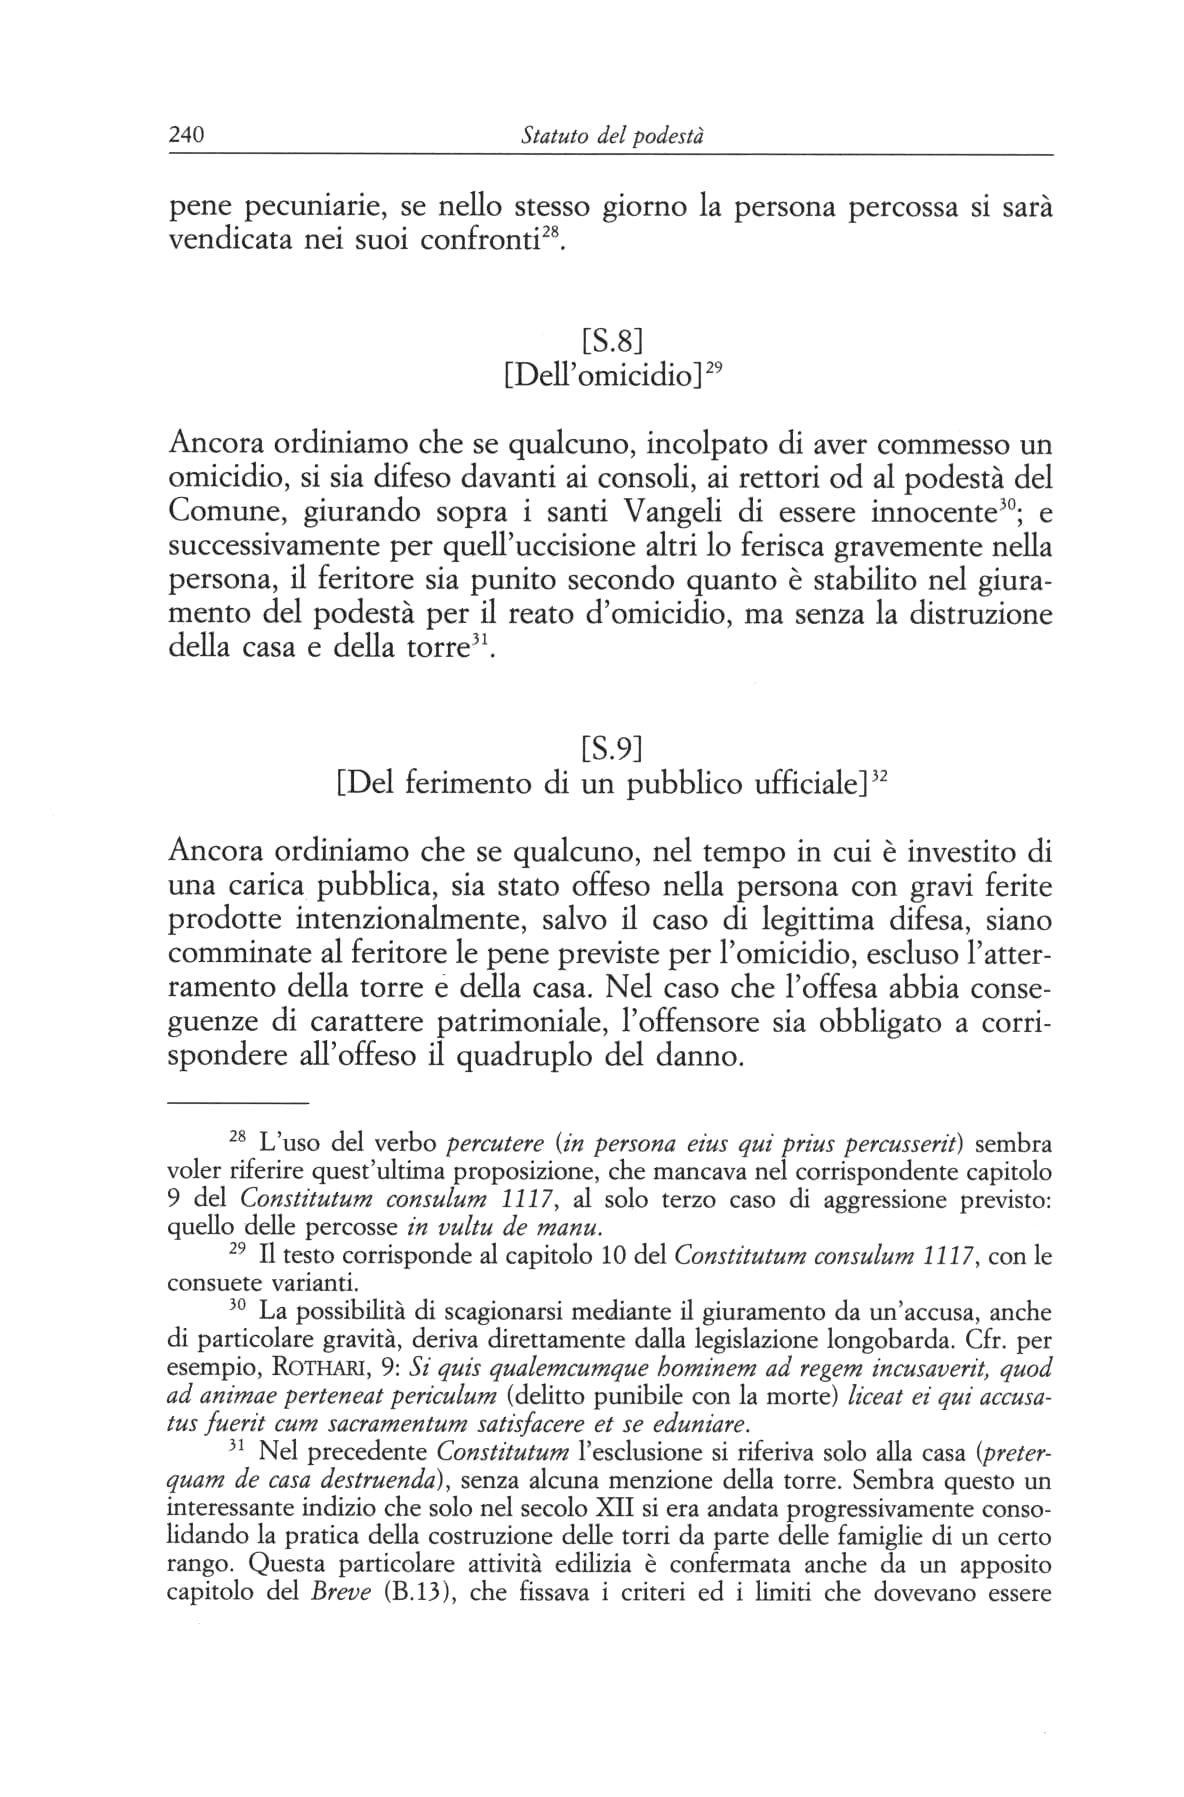 statuti pistoiesi del sec.XII 0240.jpg